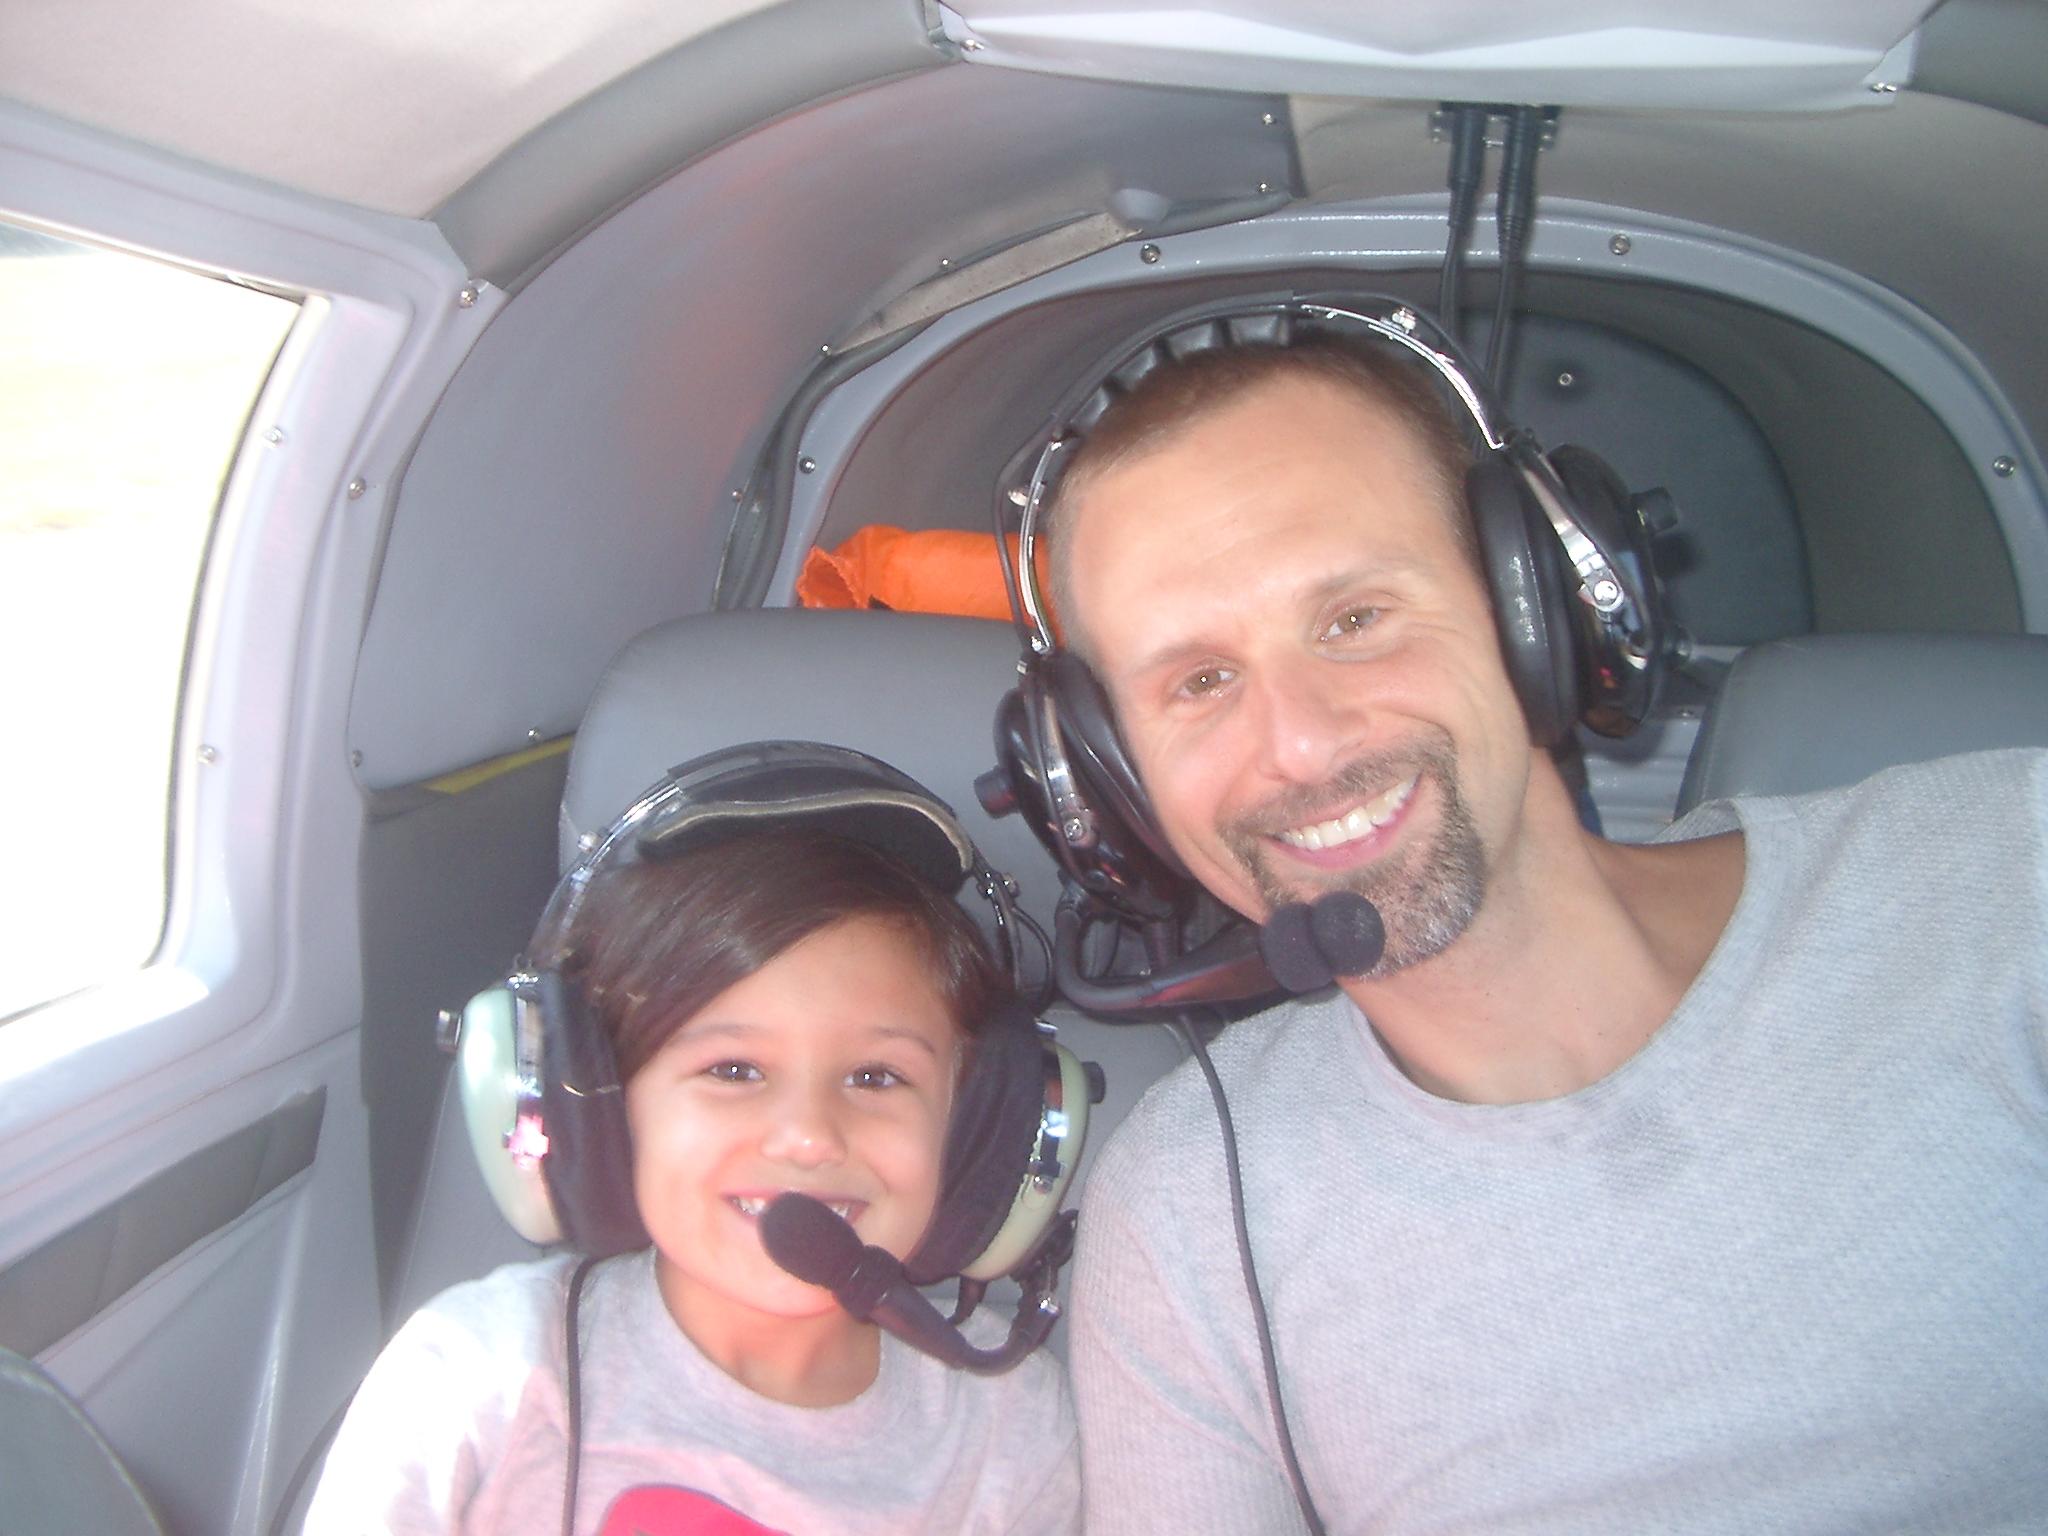 Pilot Charles George flying passenger Chris N. and his daughter Christina.